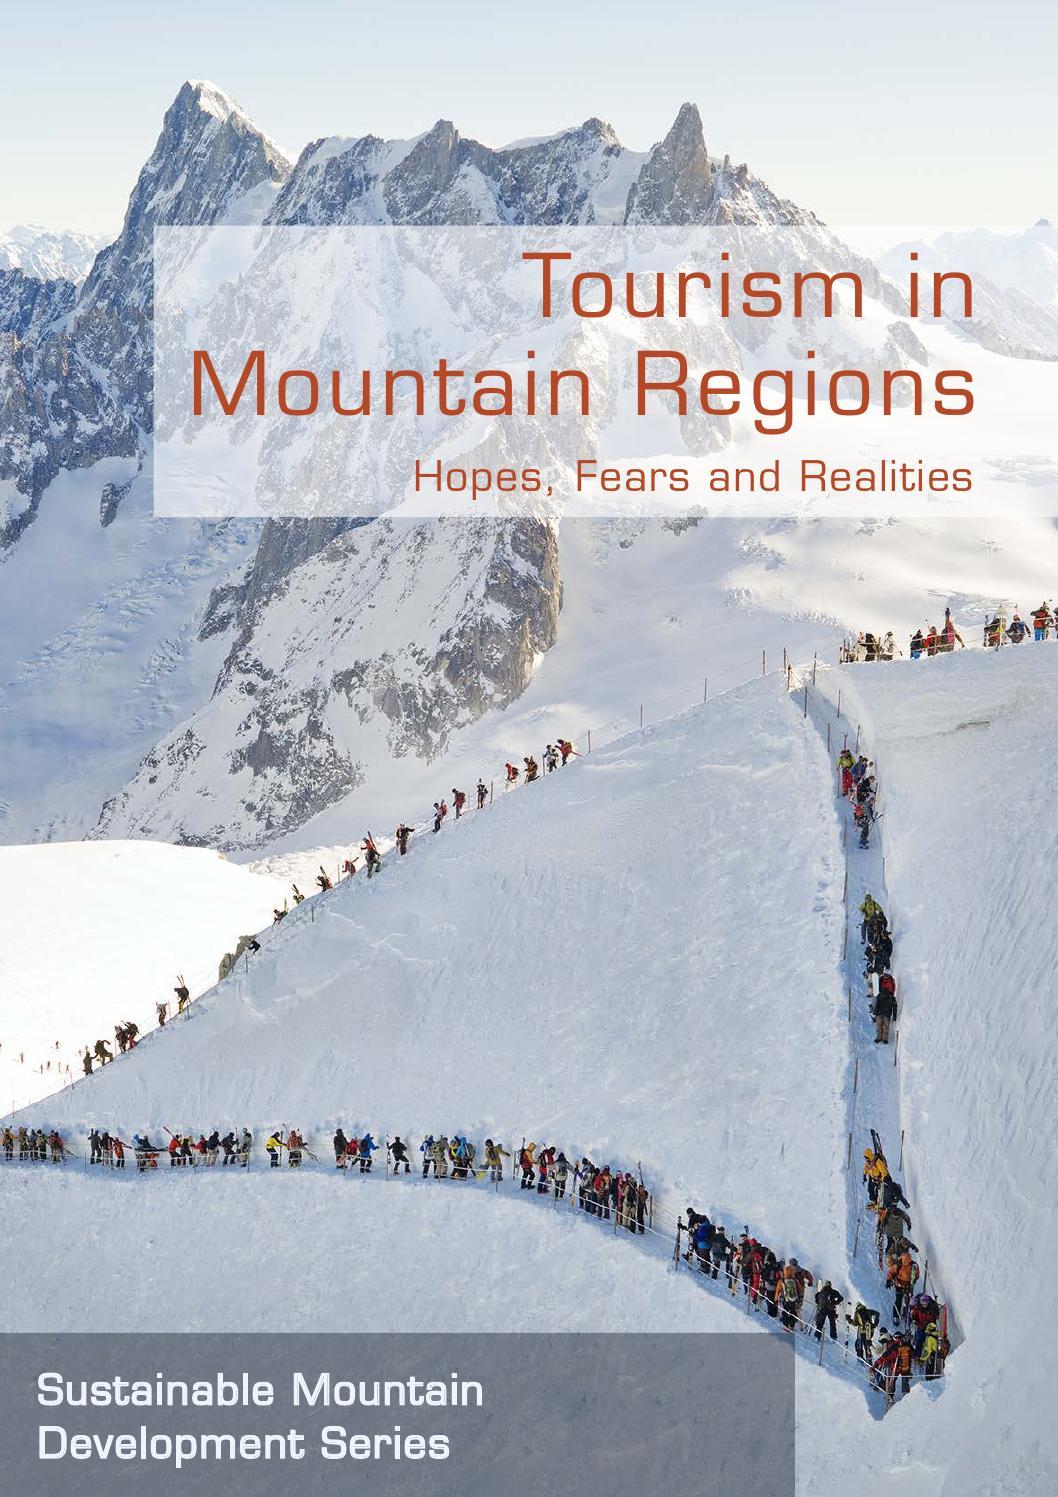 7ac5c215d4fa Tourism in Mountain Regions by Jovan Nikolić - issuu